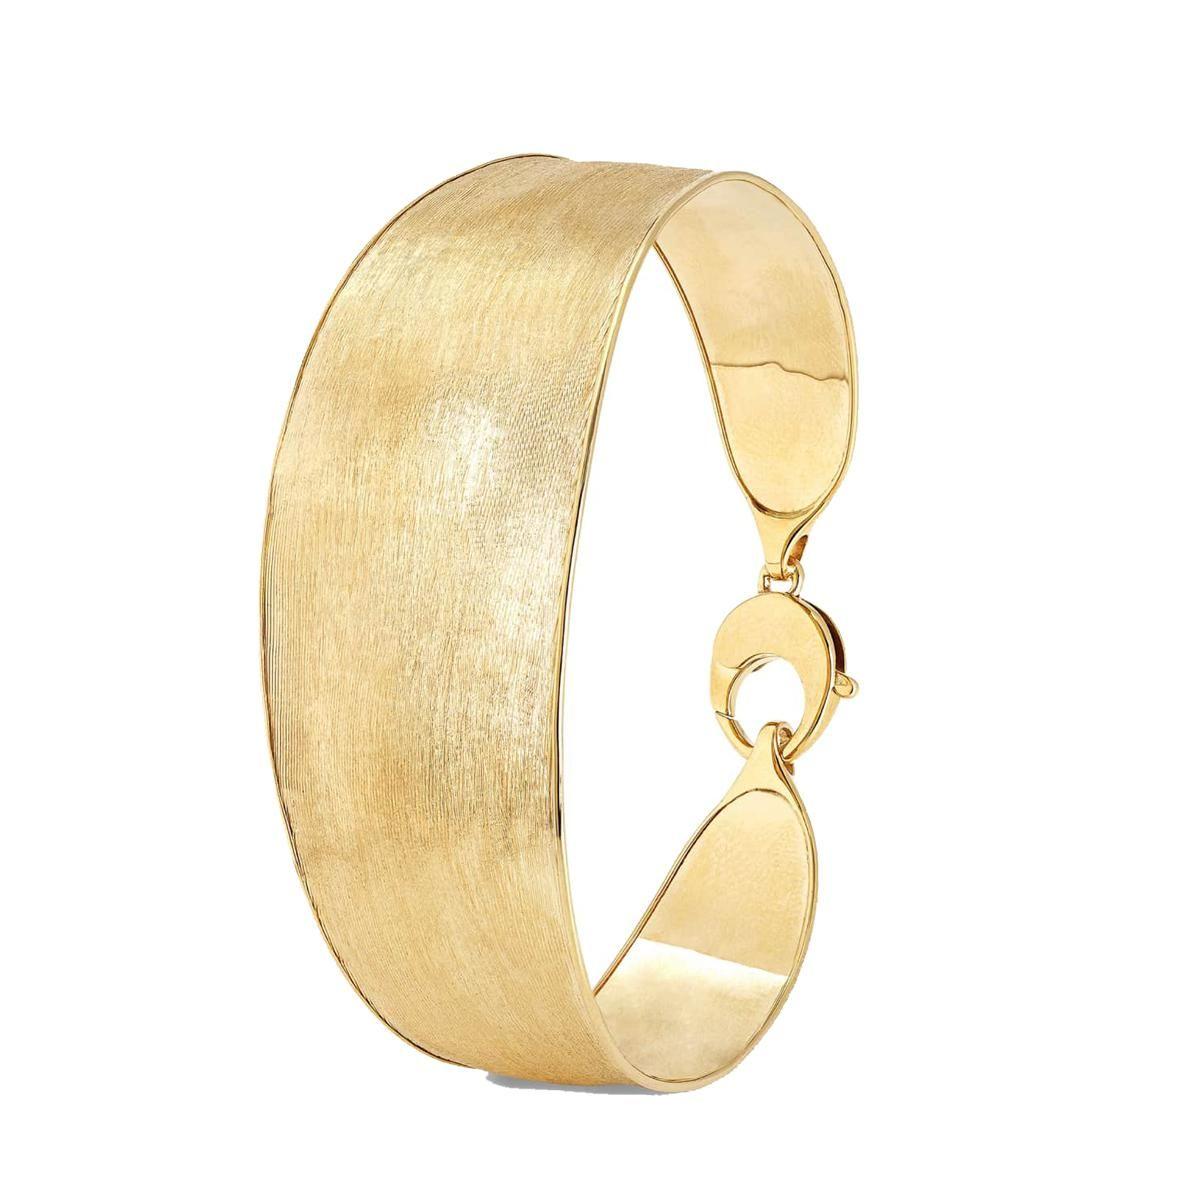 marco bicego 18k lunaria yellow gold bangle bracelet